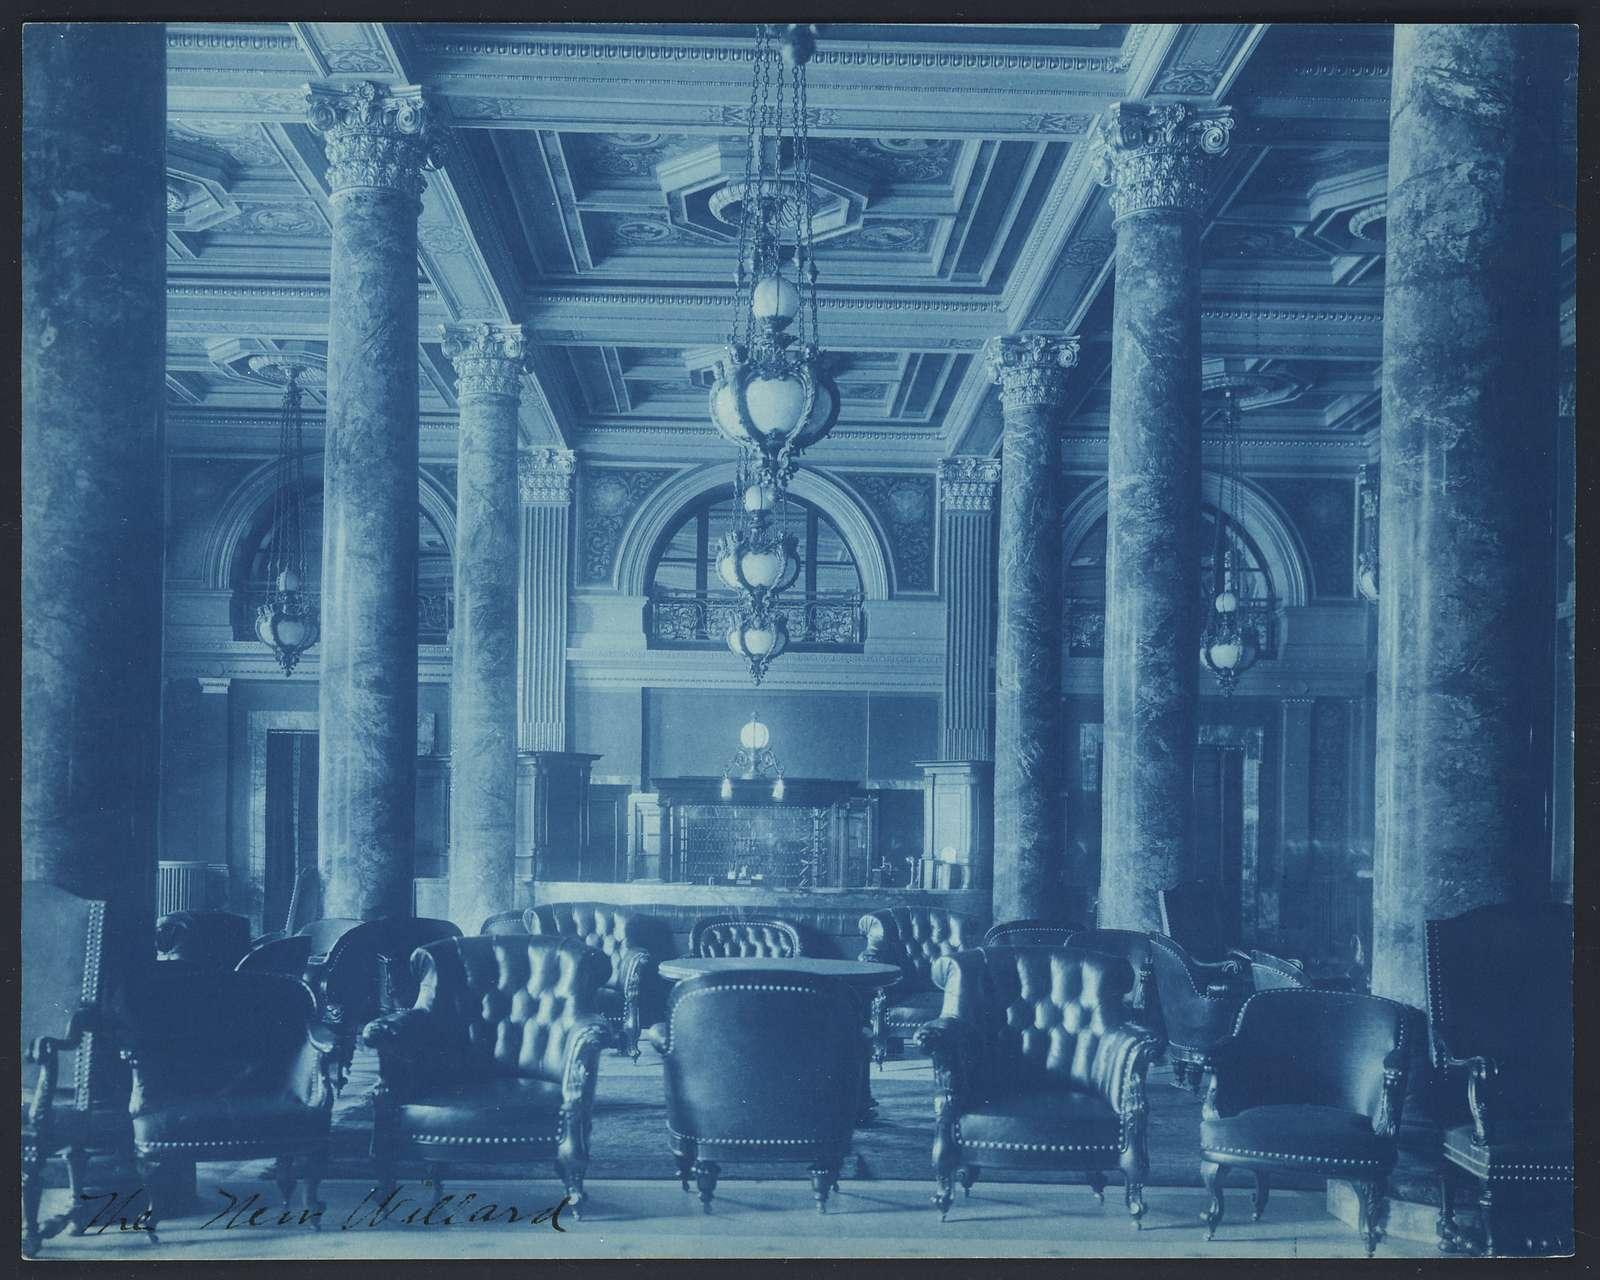 [Willard Hotel lobby]